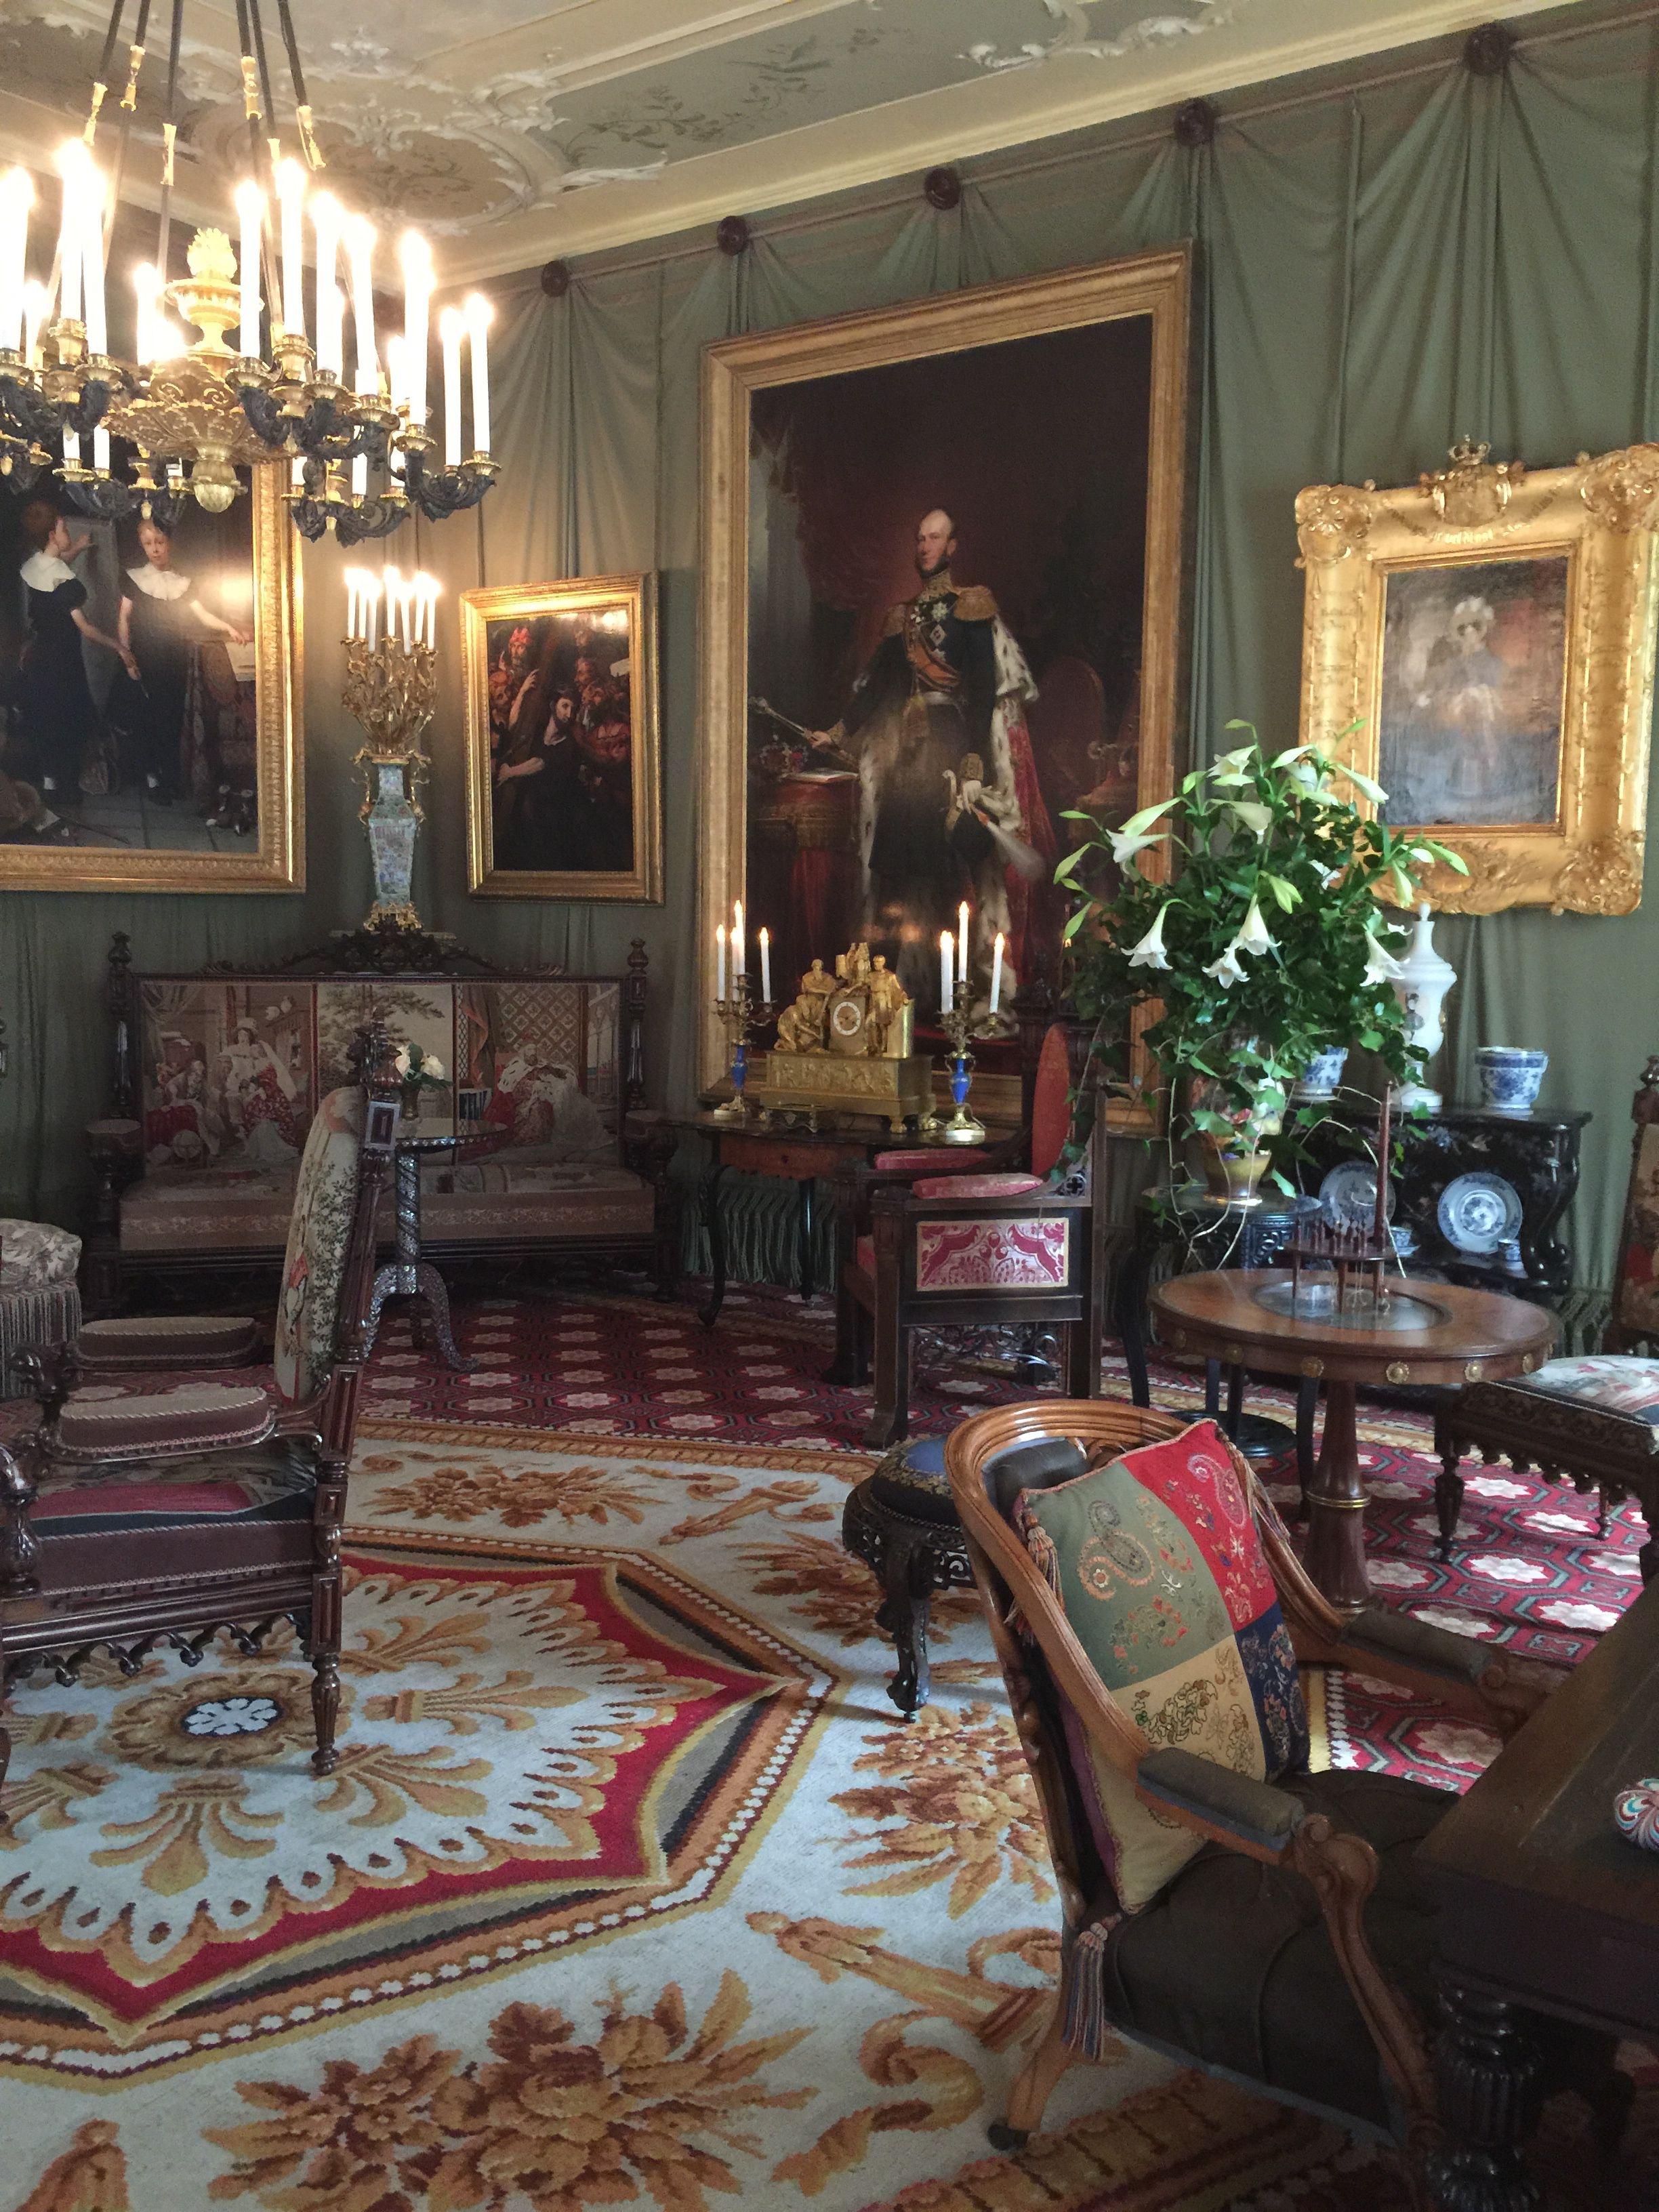 Het Loo Palace, Apeldoorn - Holland, May 2015